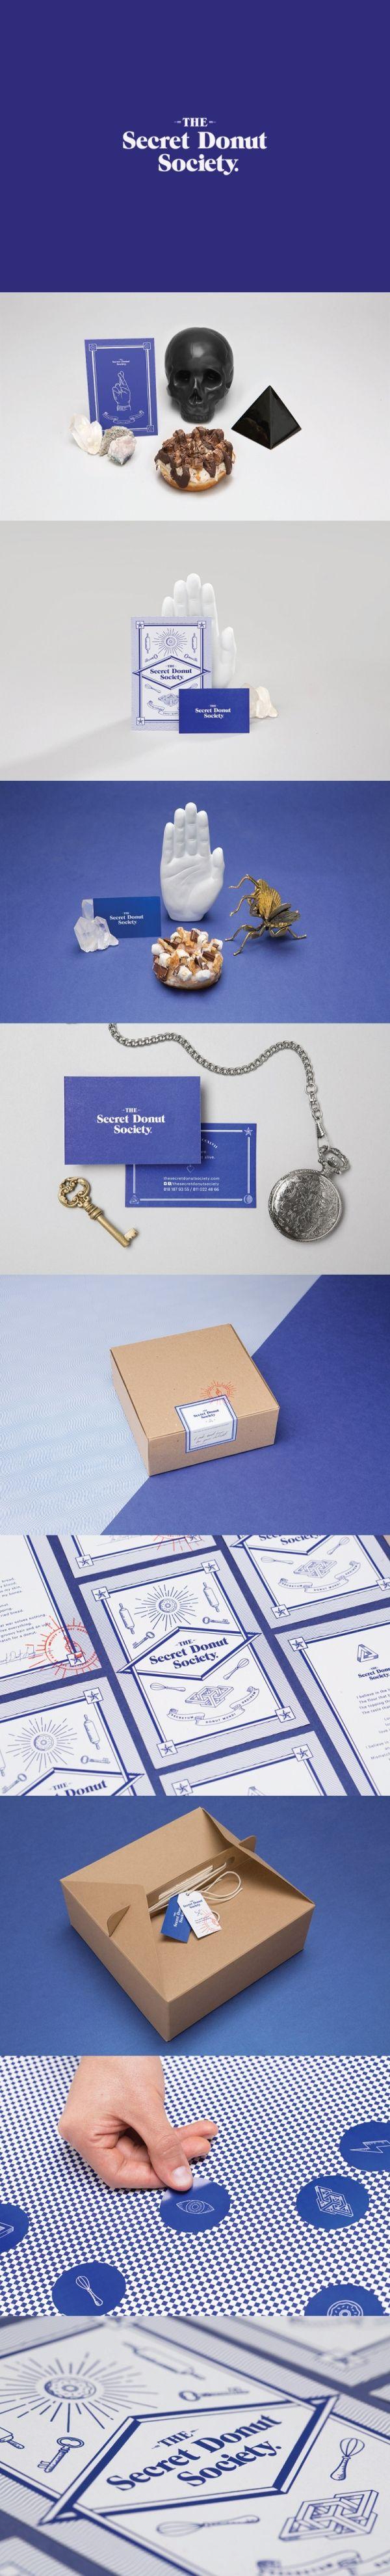 The Secret Donut Society. Let's keep the secret alive. #branding #identity #design